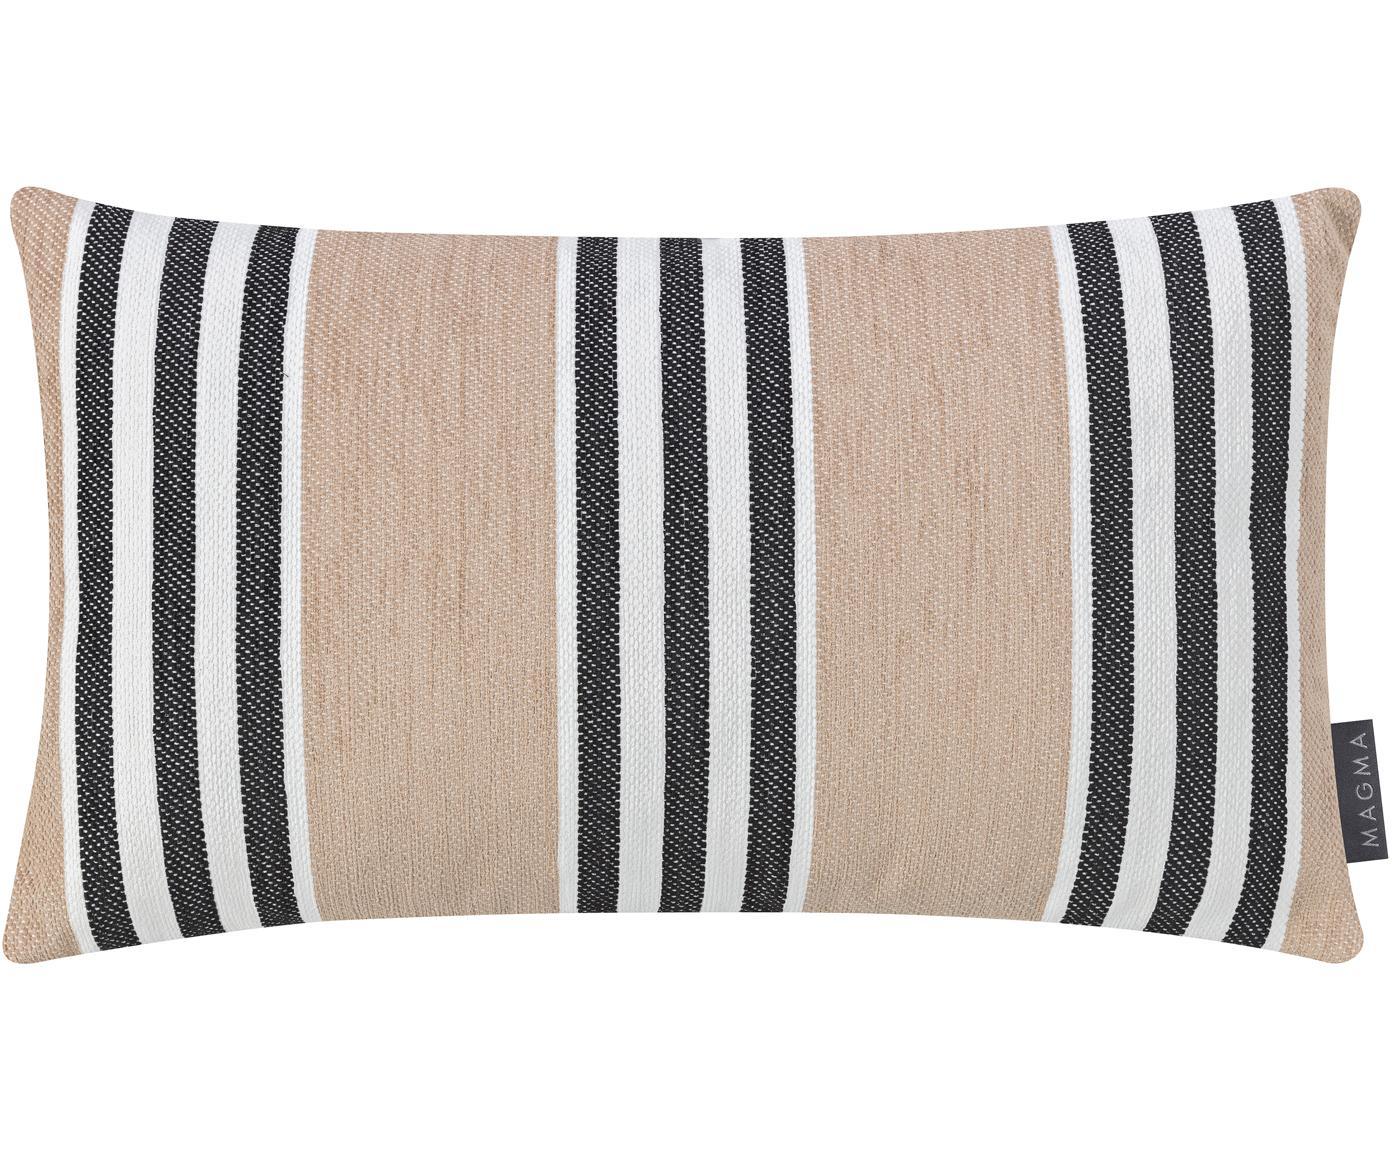 Funda de cojín Palermo, Color arena, blanco, negro, An 30 x L 50 cm